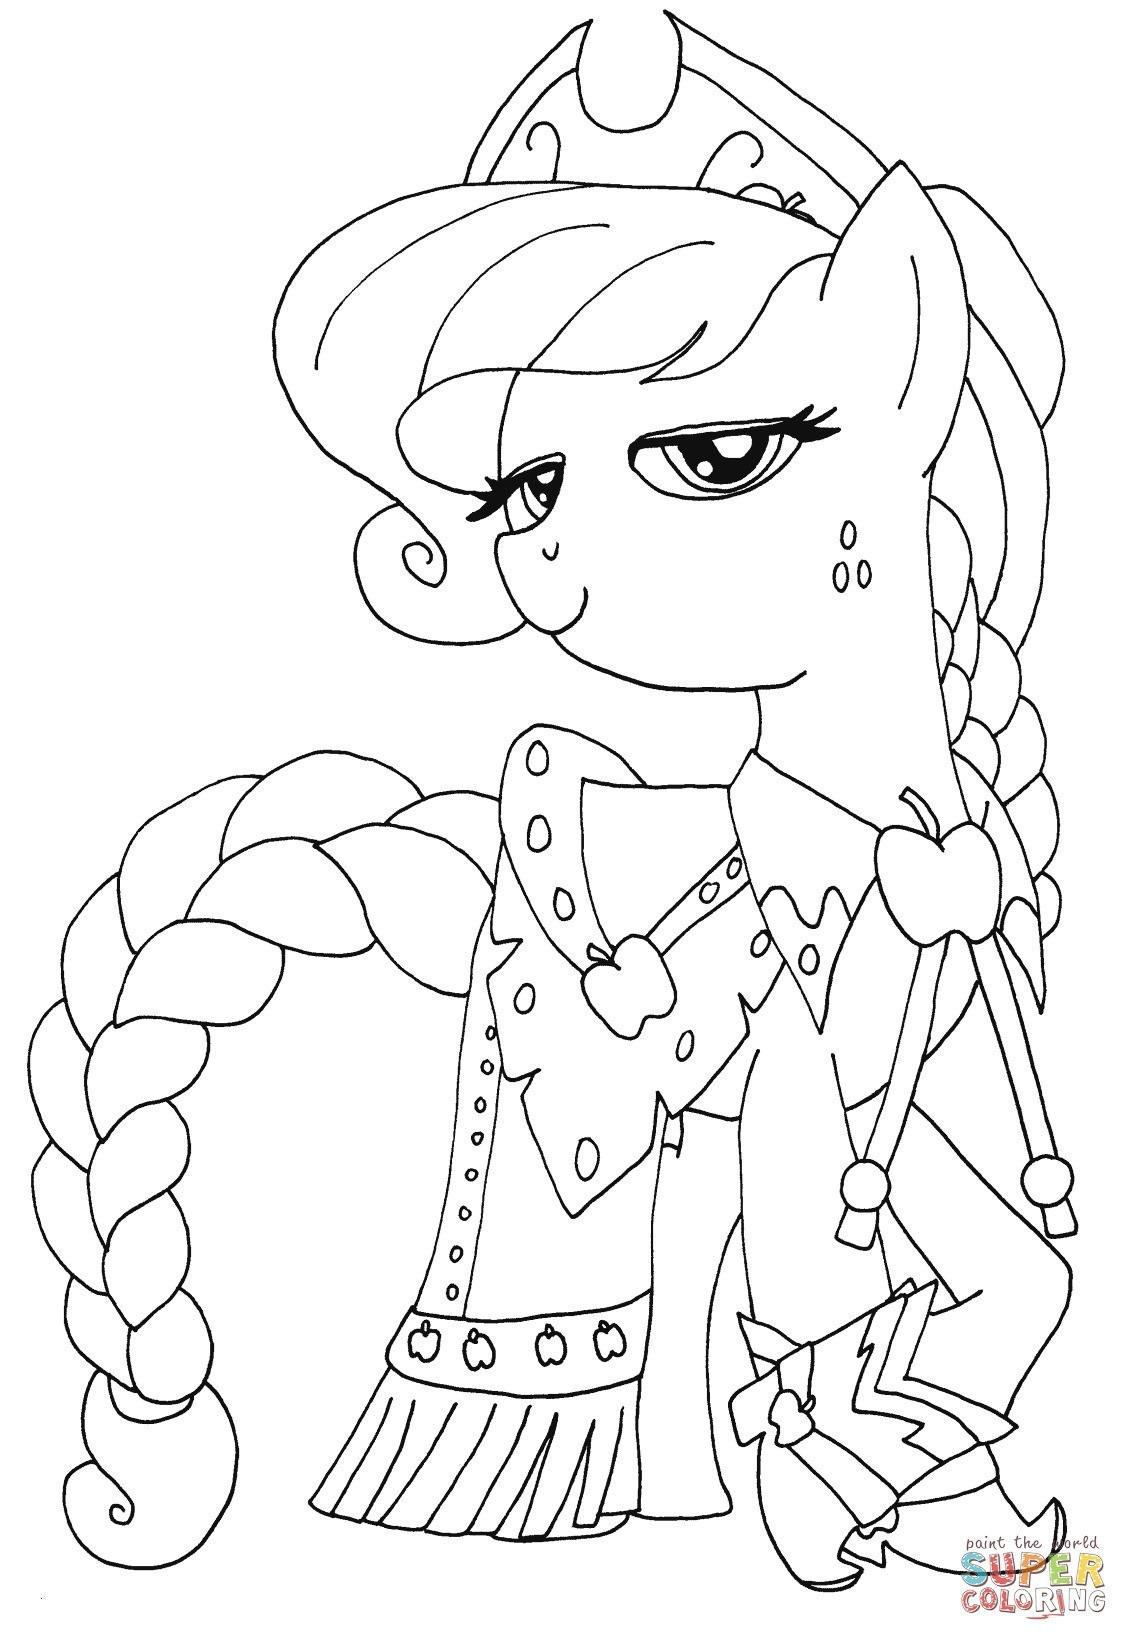 My Little Pony Friendship is Magic Ausmalbilder Das Beste Von 40 My Little Pony Friendship is Magic Ausmalbilder Scoredatscore Bild